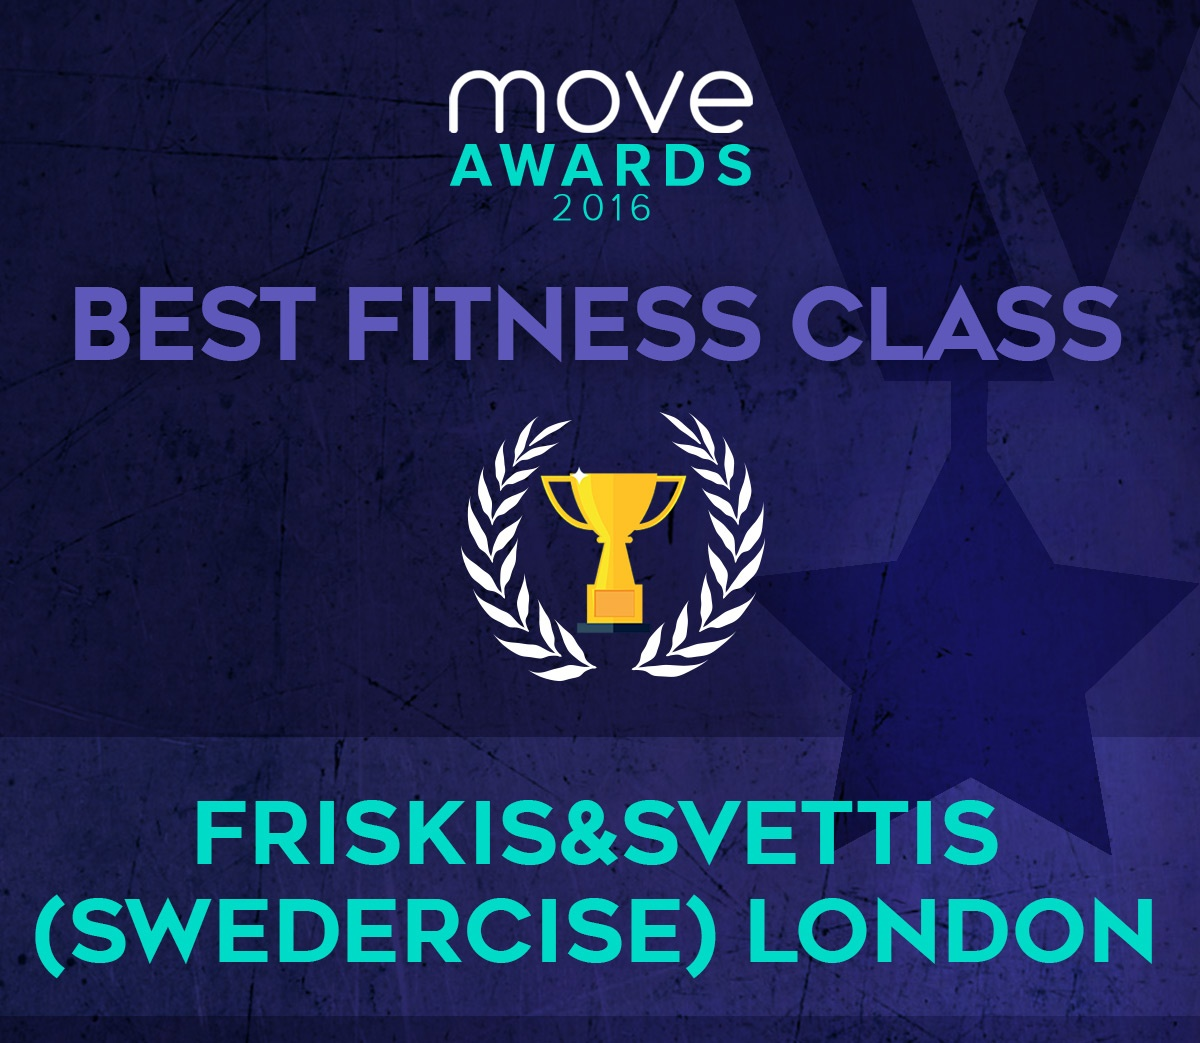 Best-Fitness-Class-London.jpg